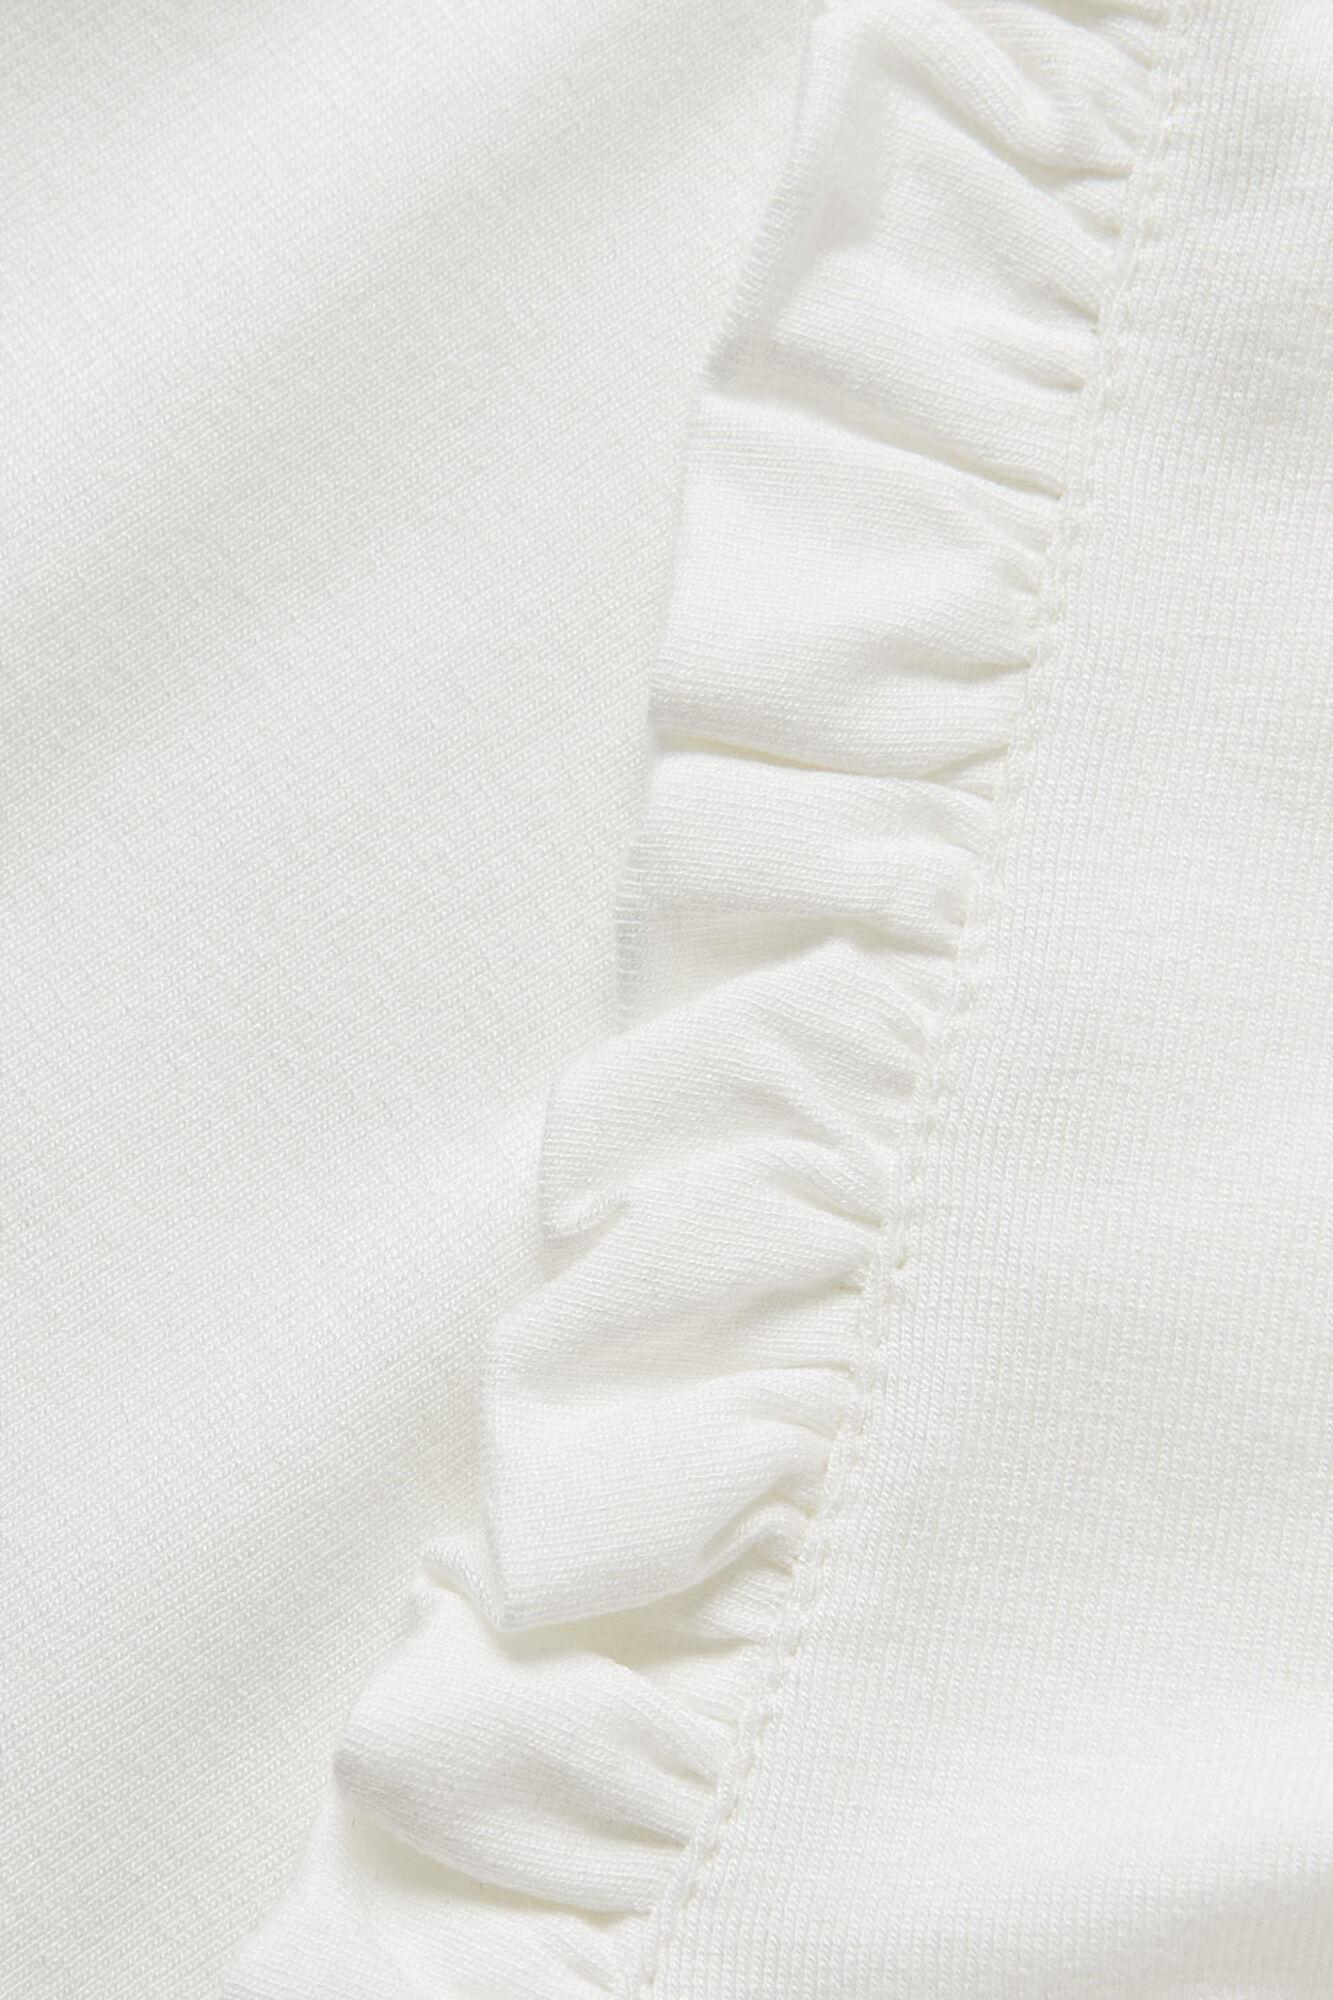 EDWINA SHIRT, Cream, hi-res